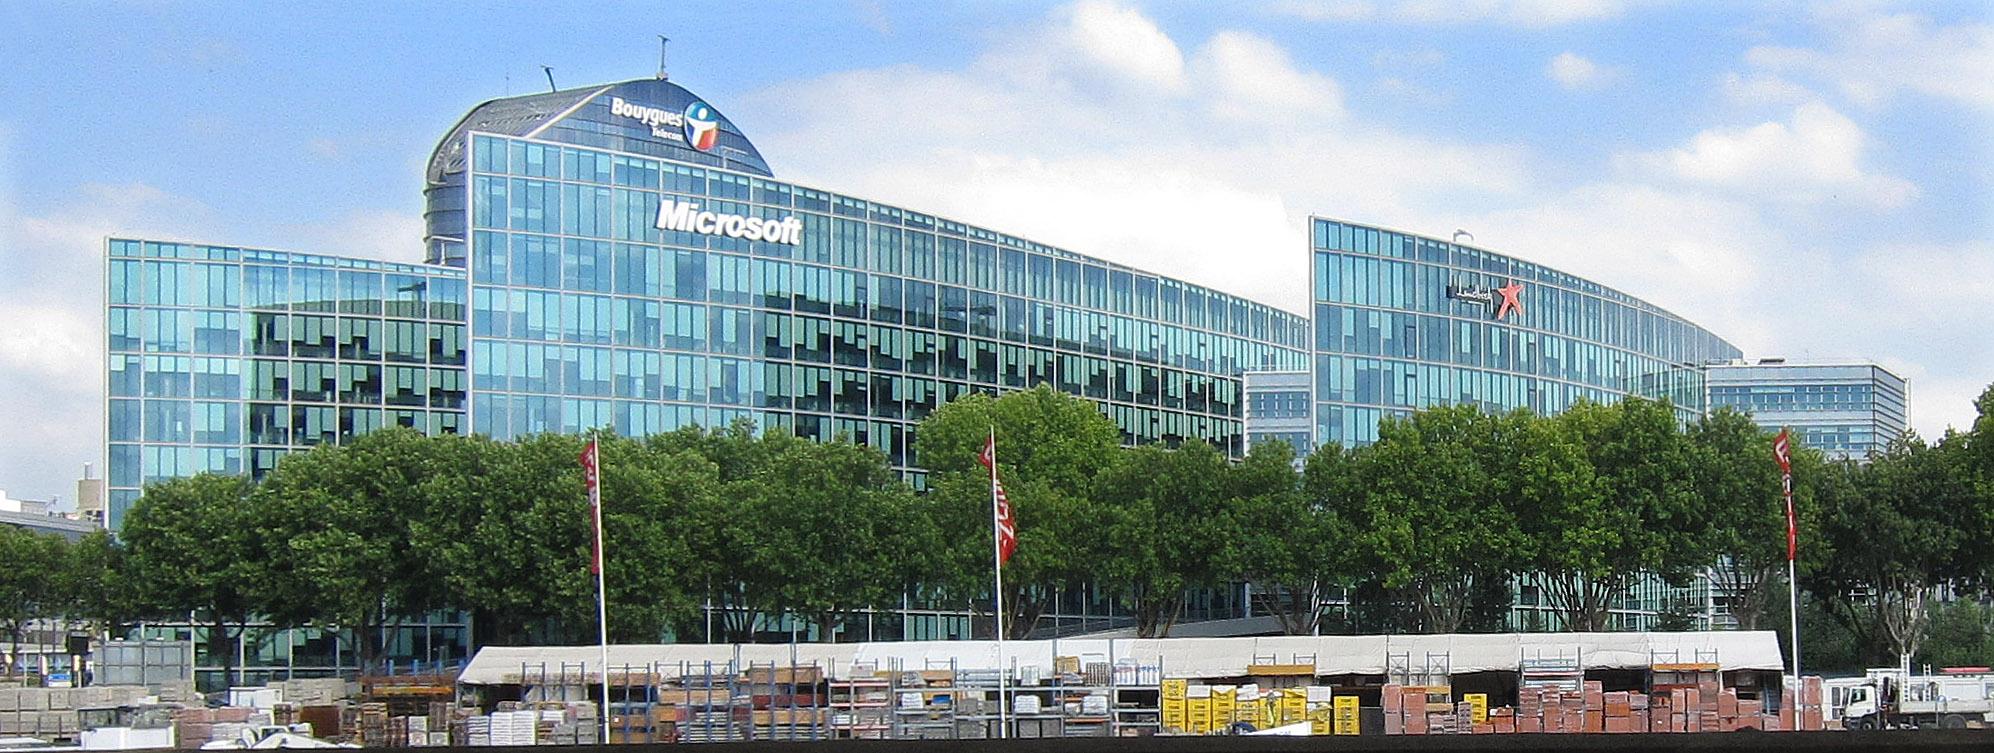 Microsoft in paris france